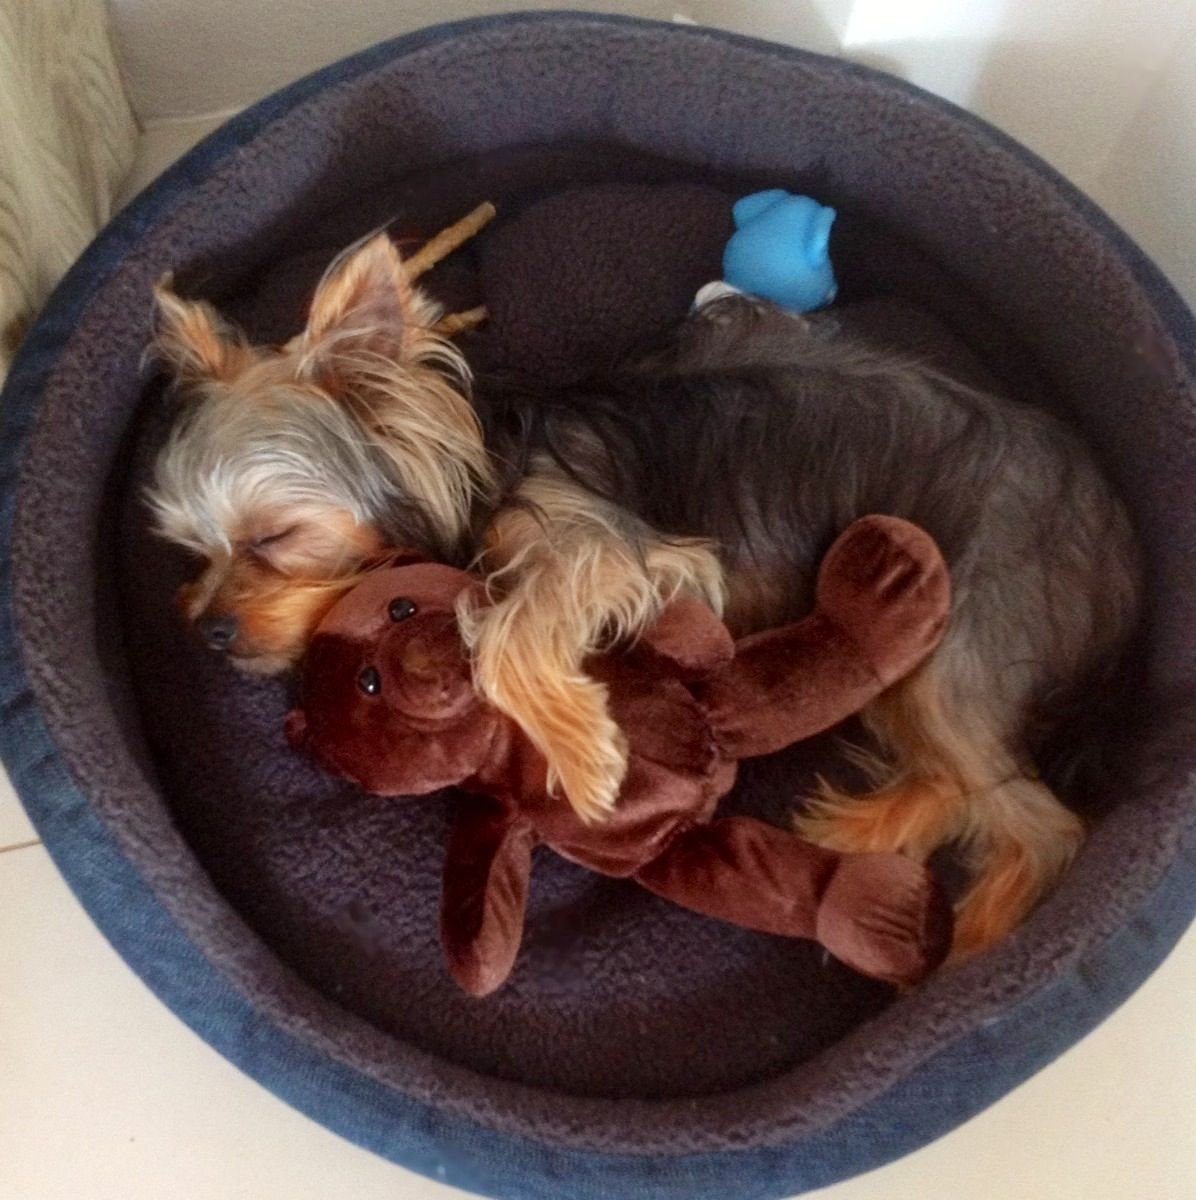 Puppy sleeping with his teddy bear